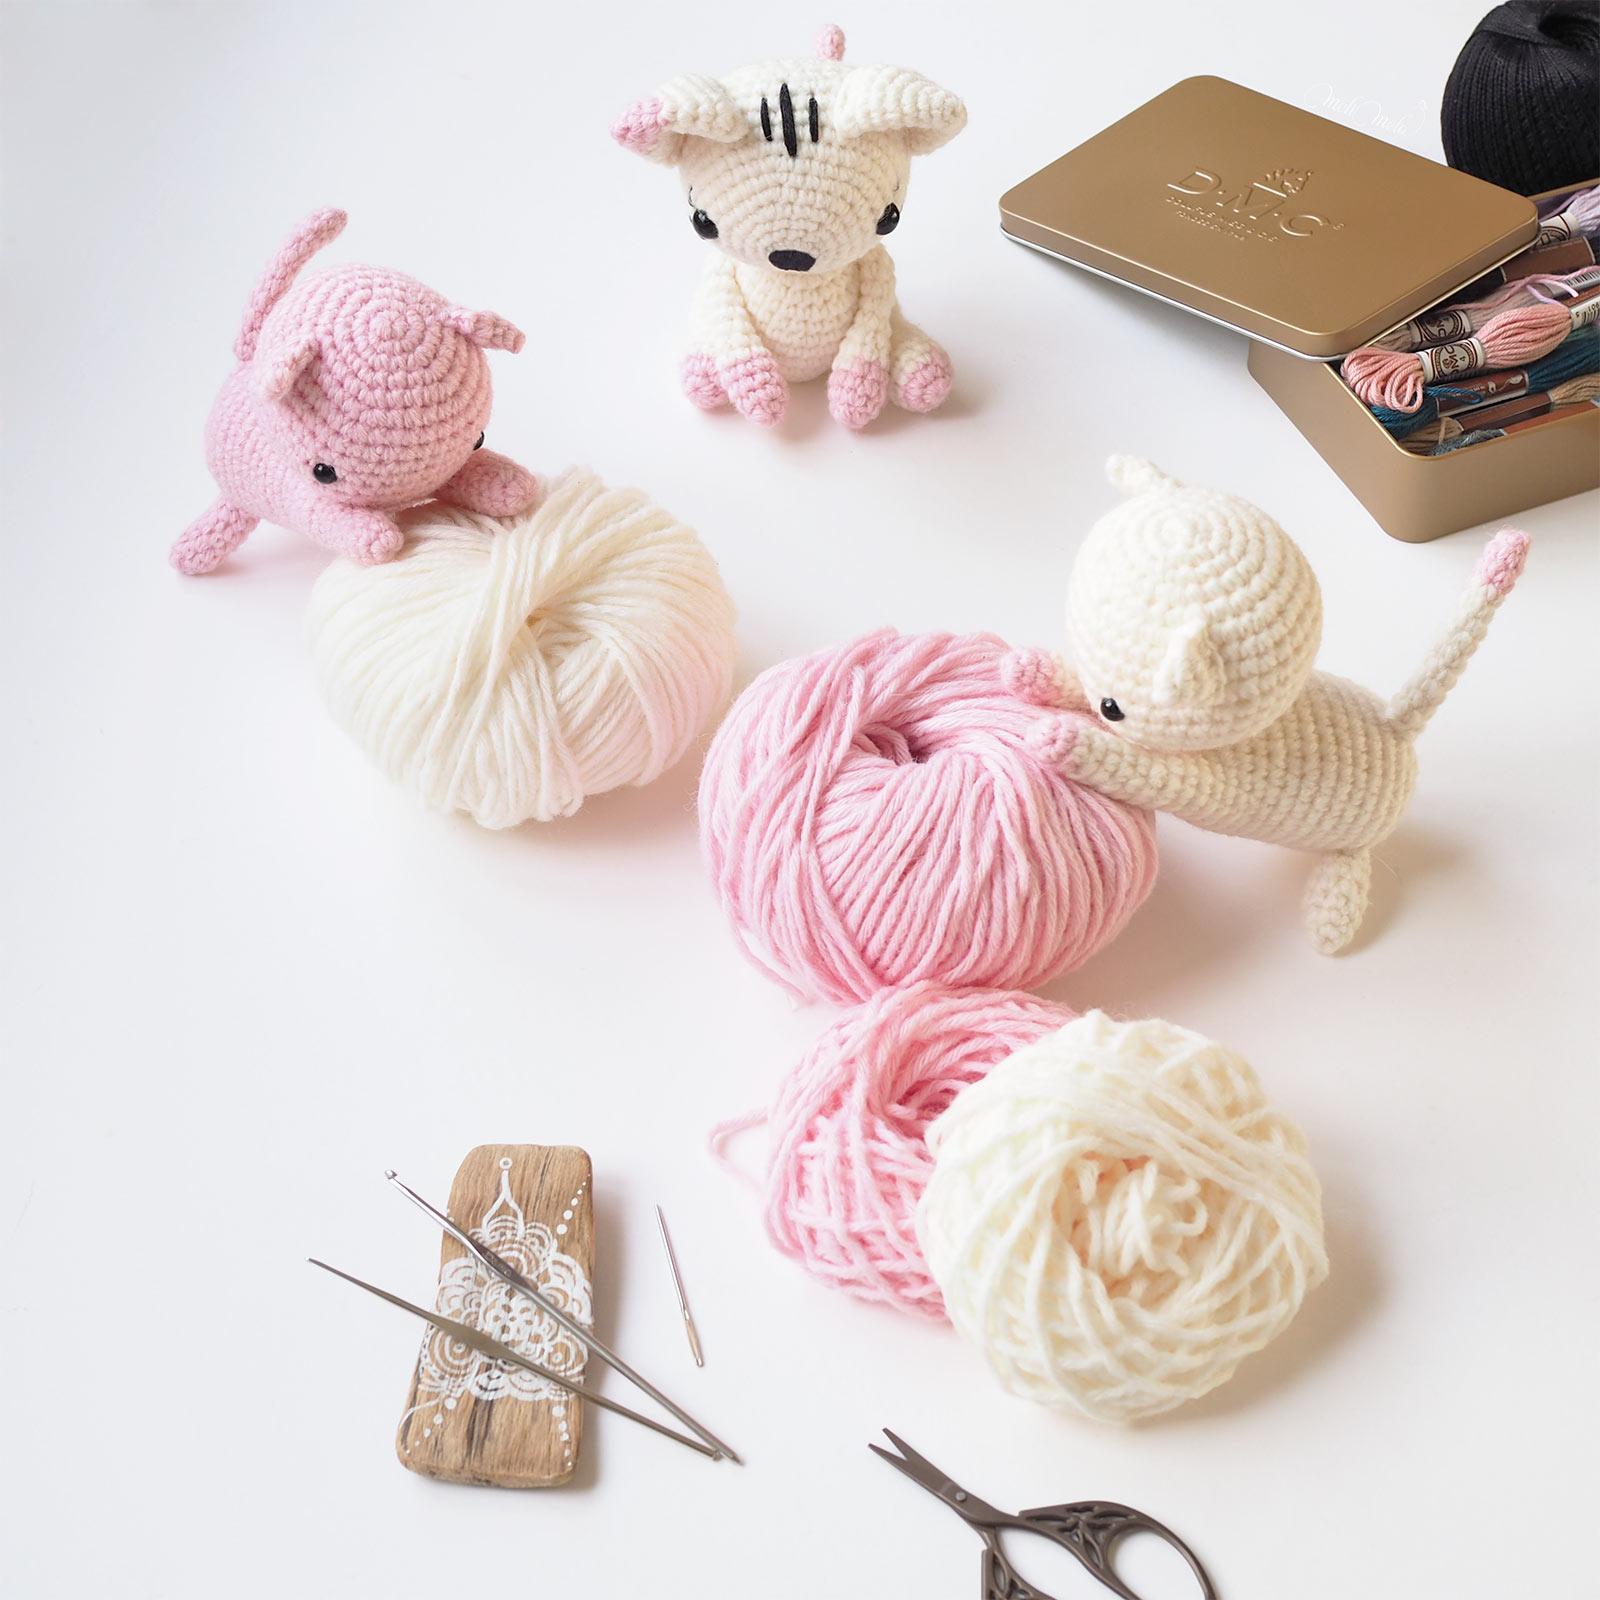 famille chachat crochet créations encours laboutiquedemelimelo